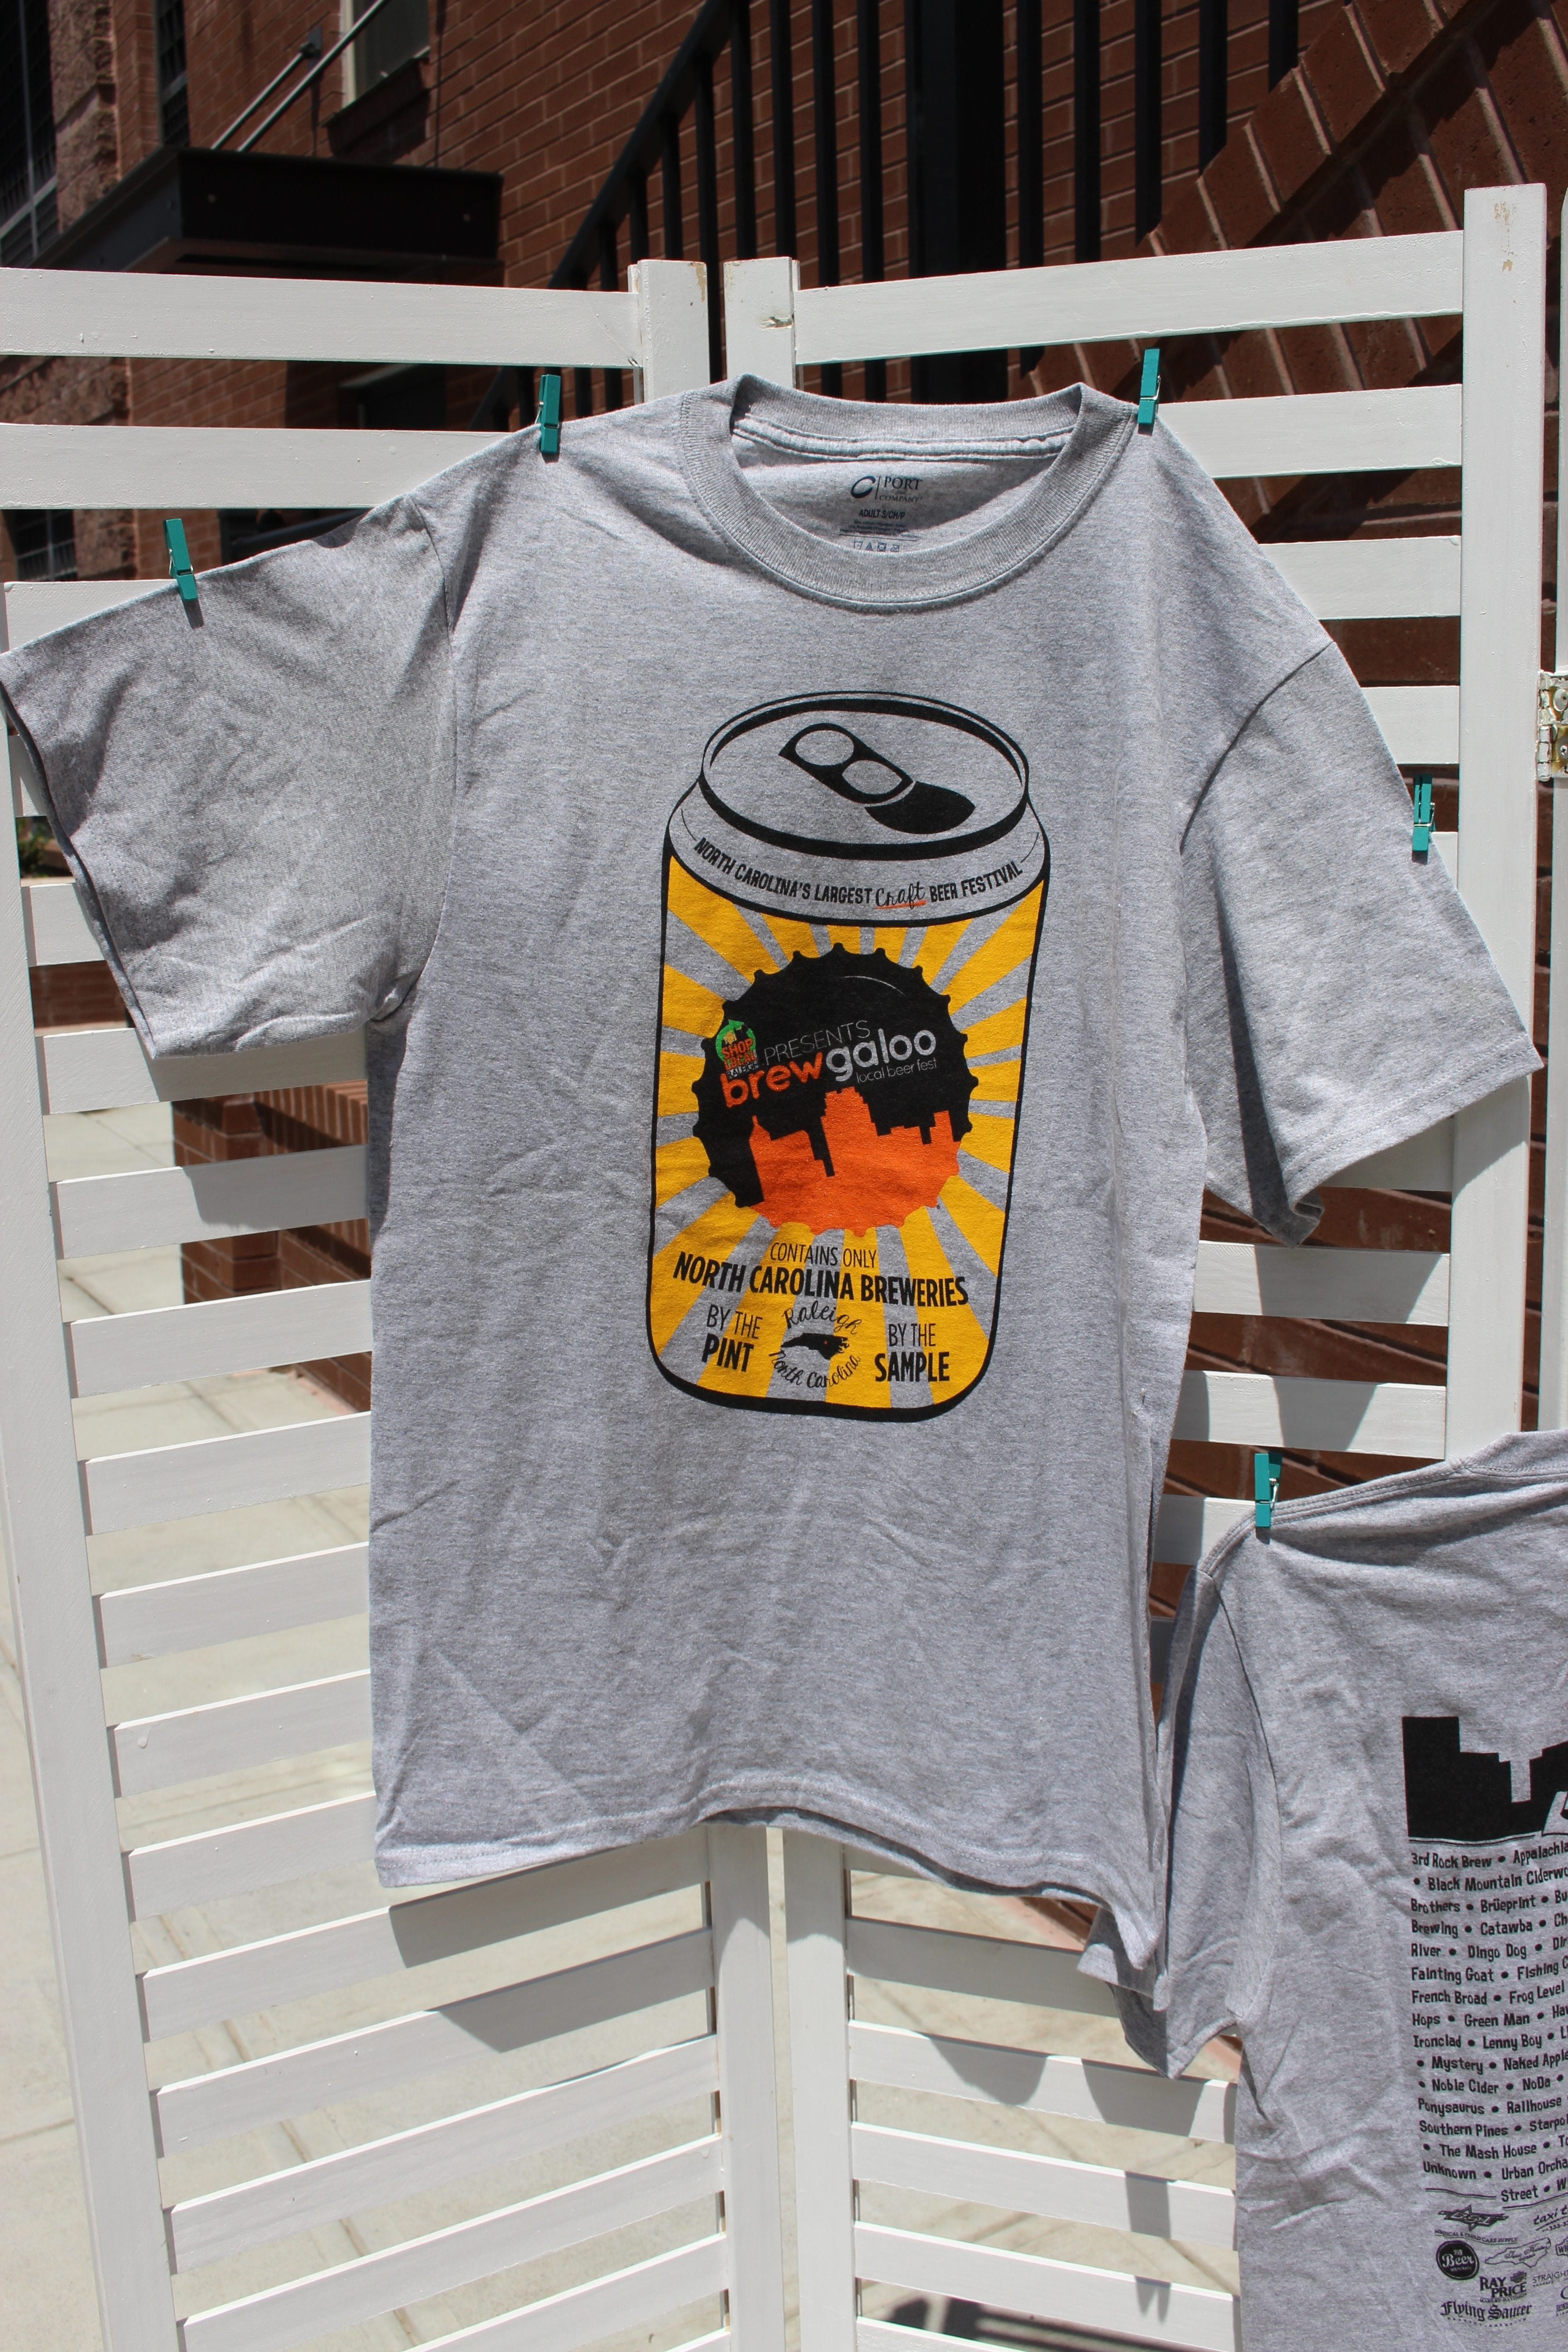 491ba7456 2016 Brewgaloo T-shirt - Shop Local Raleigh